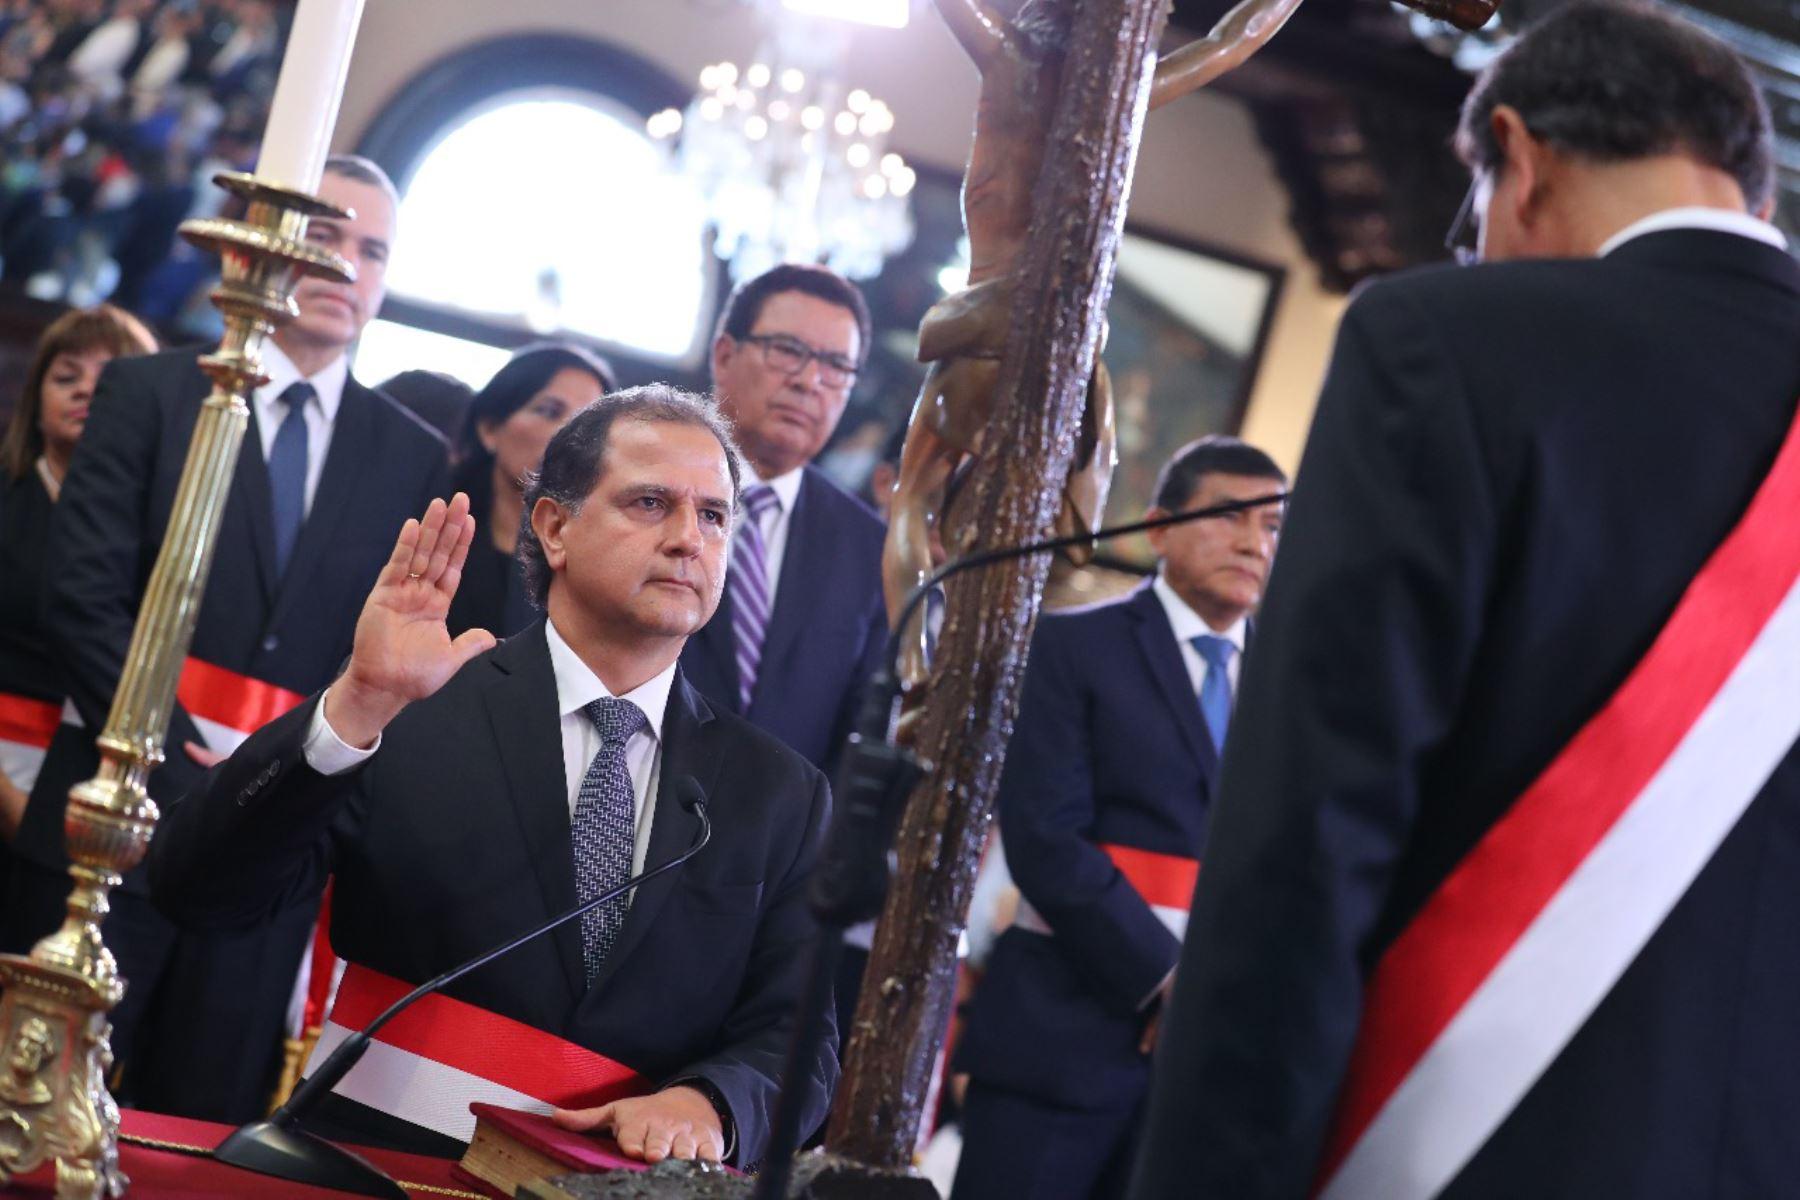 Francisco Ismodes juramenta como ministro de Energía y Minas. Foto: ANDINA/Prensa Presidencia